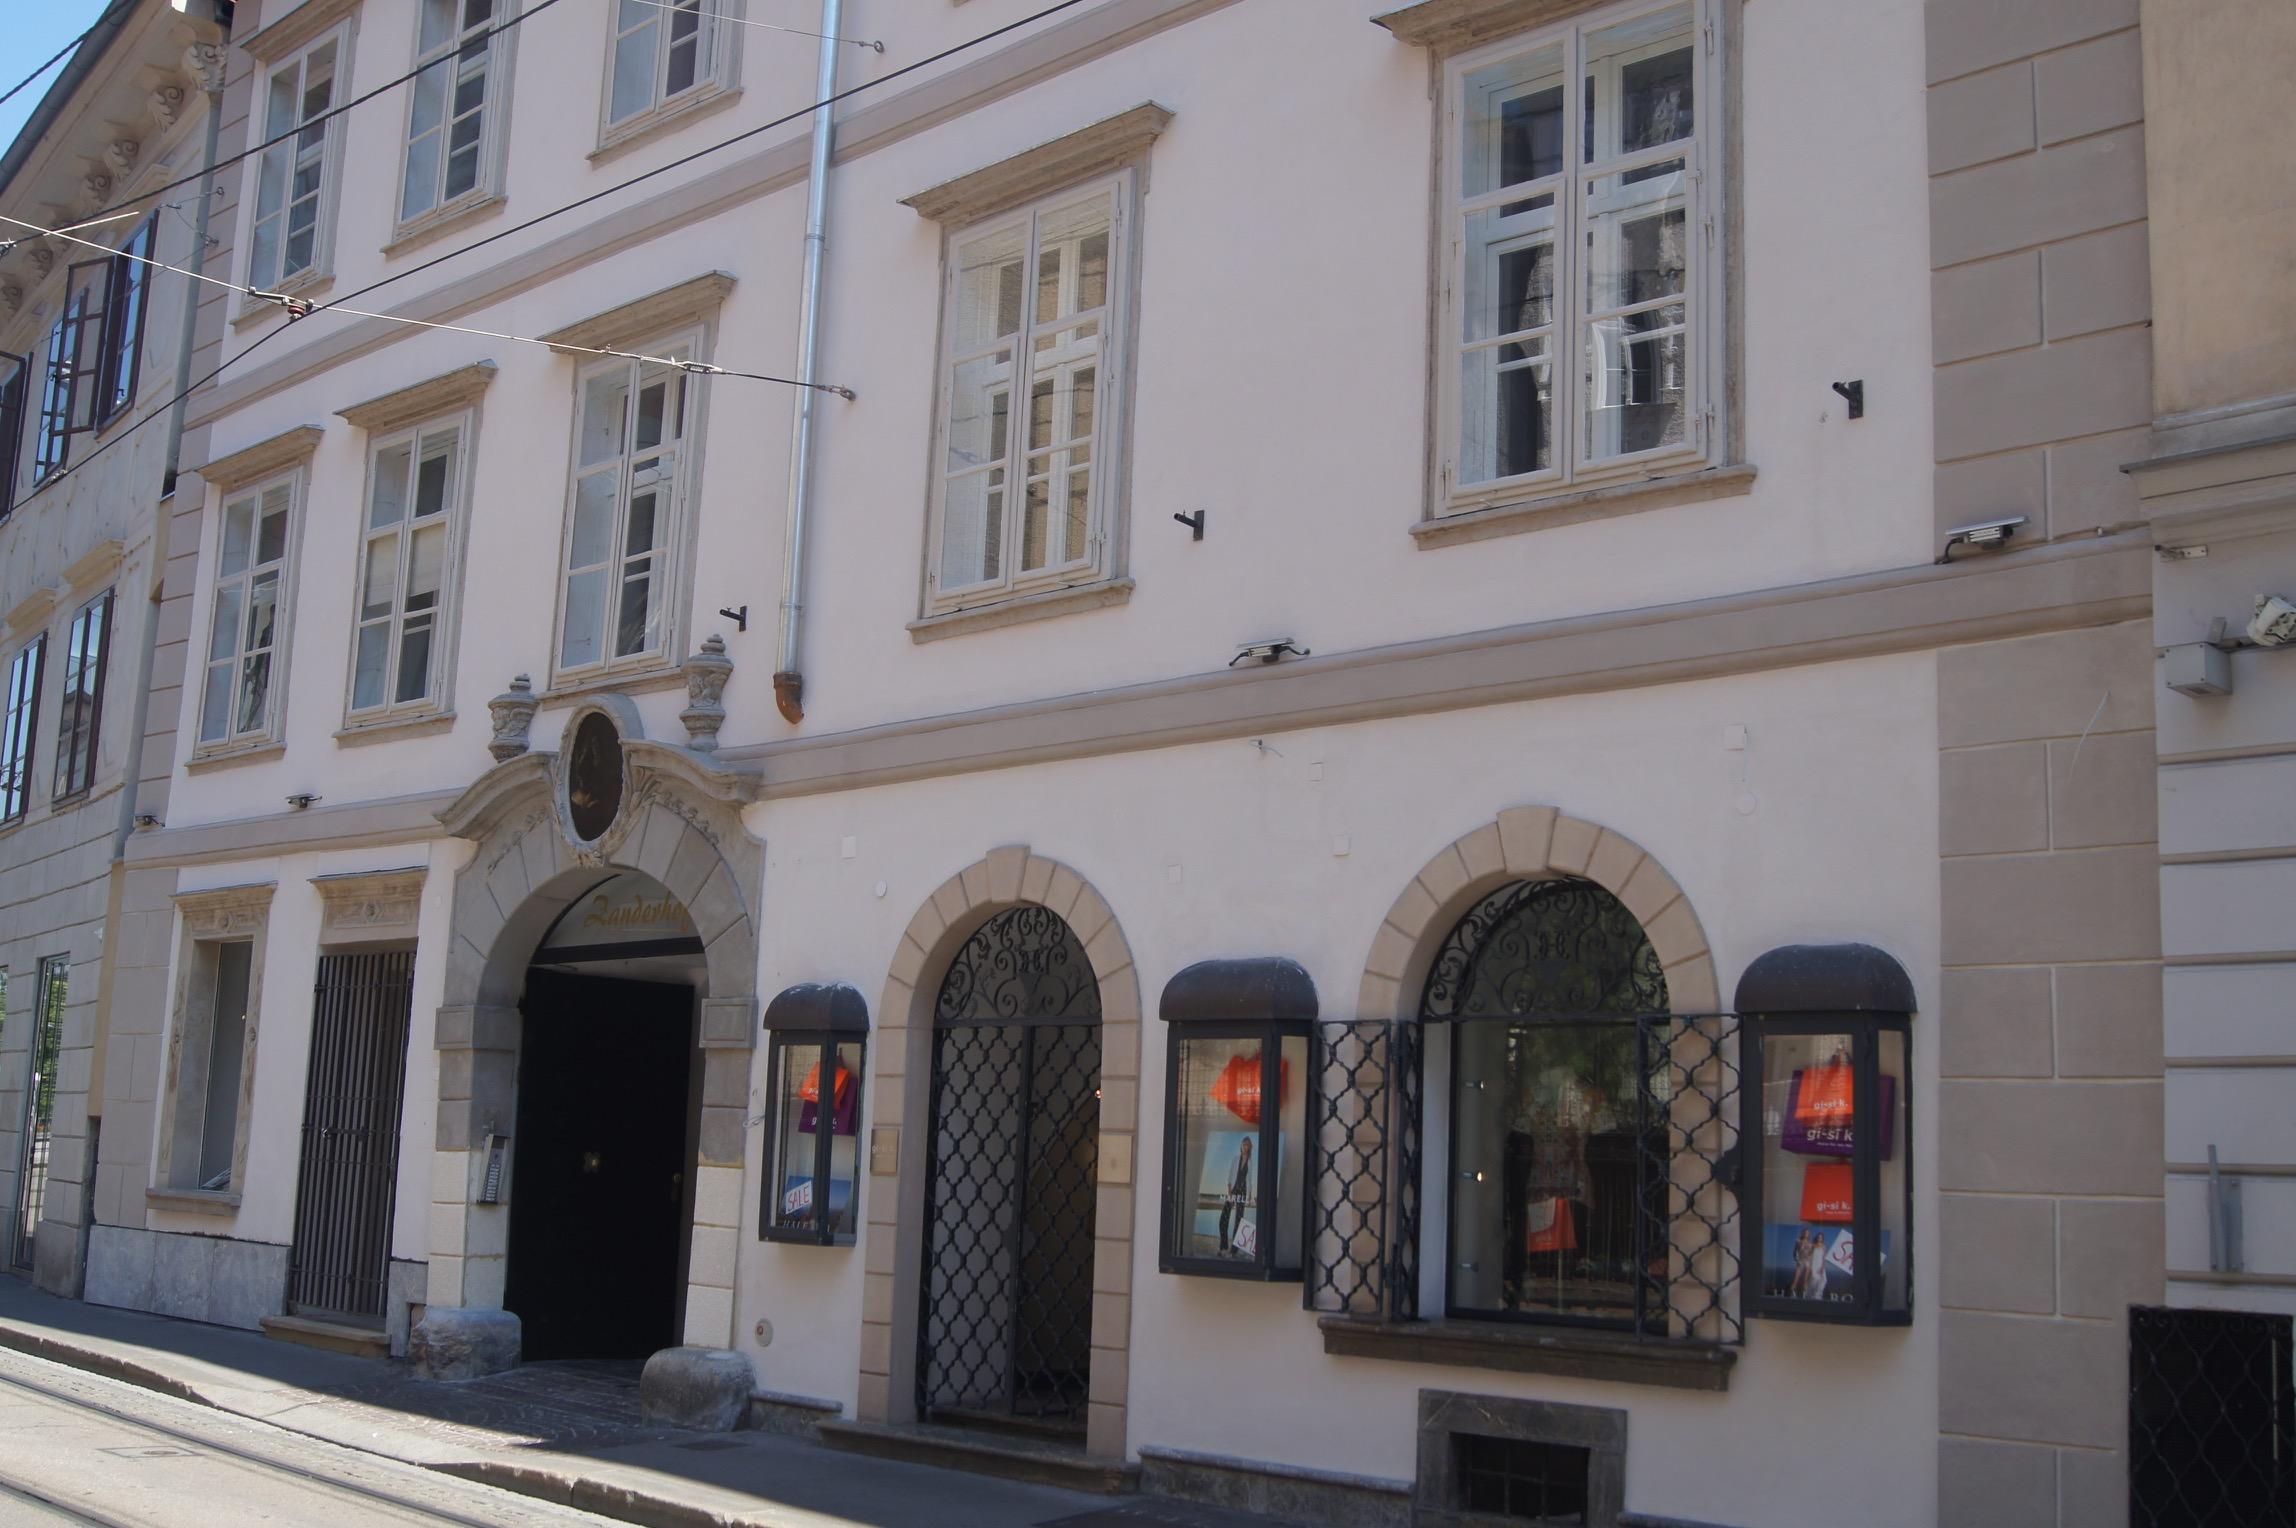 Zanderhof Sackstraße 26